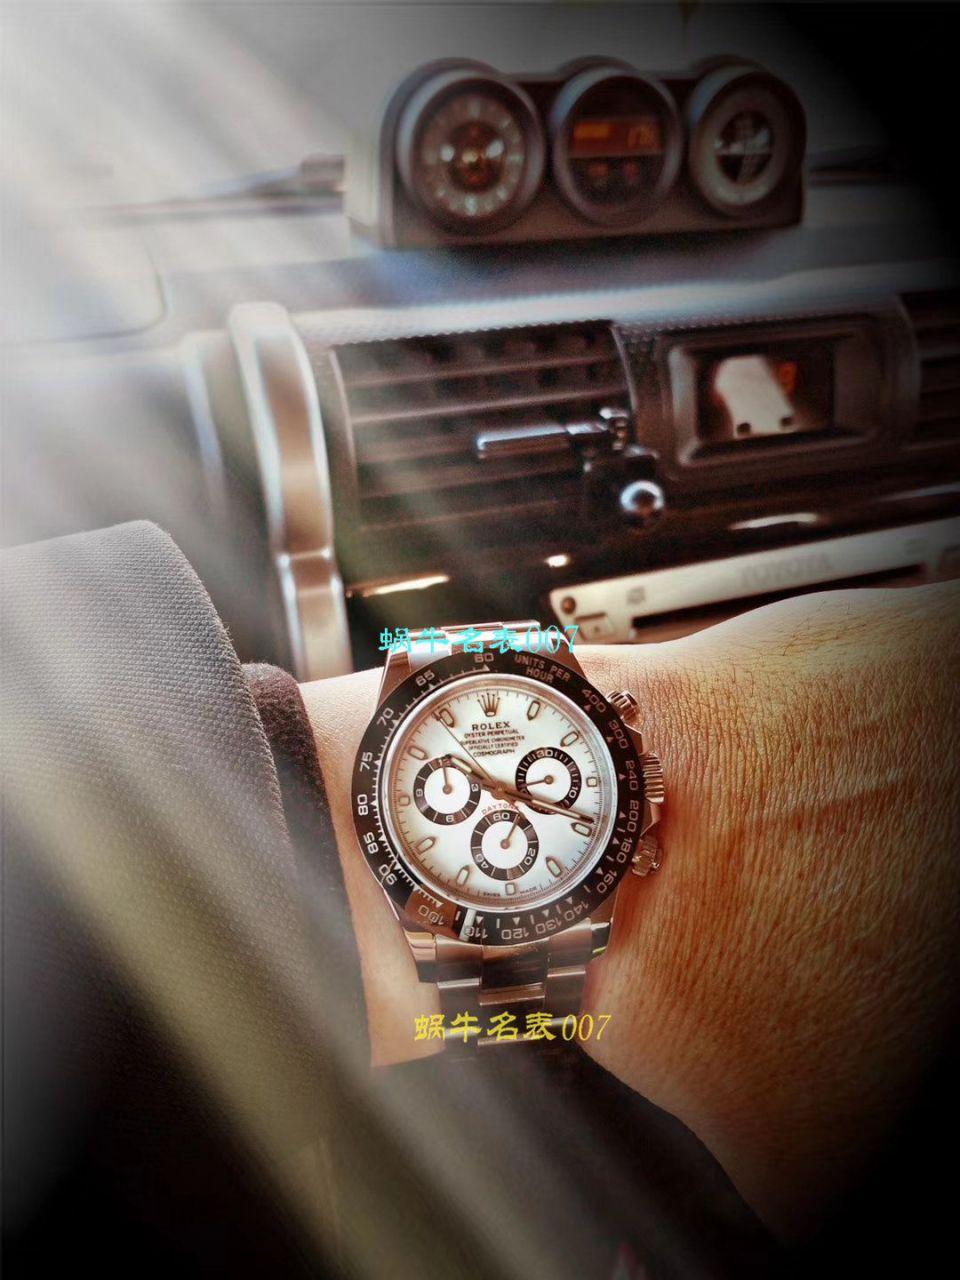 ROLEX劳力士宇宙计型迪通拿系列116500LN-78590腕表【N厂一比一超A高仿手表】N厂神作~904钢原装结构4130迪通拿 / R297